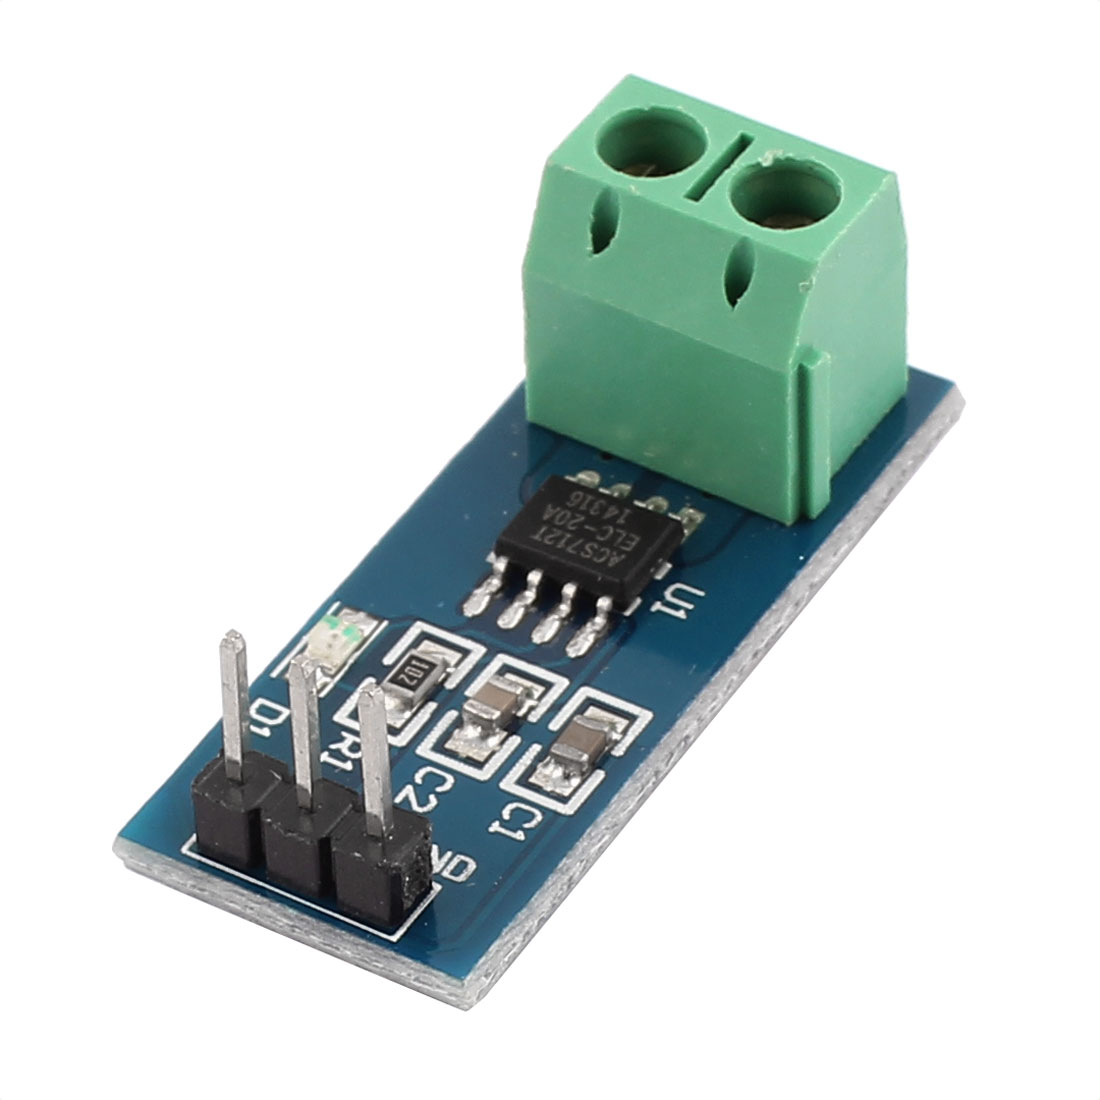 Brand New ACS712 20A Amperage Range Current Sensor Module Detector